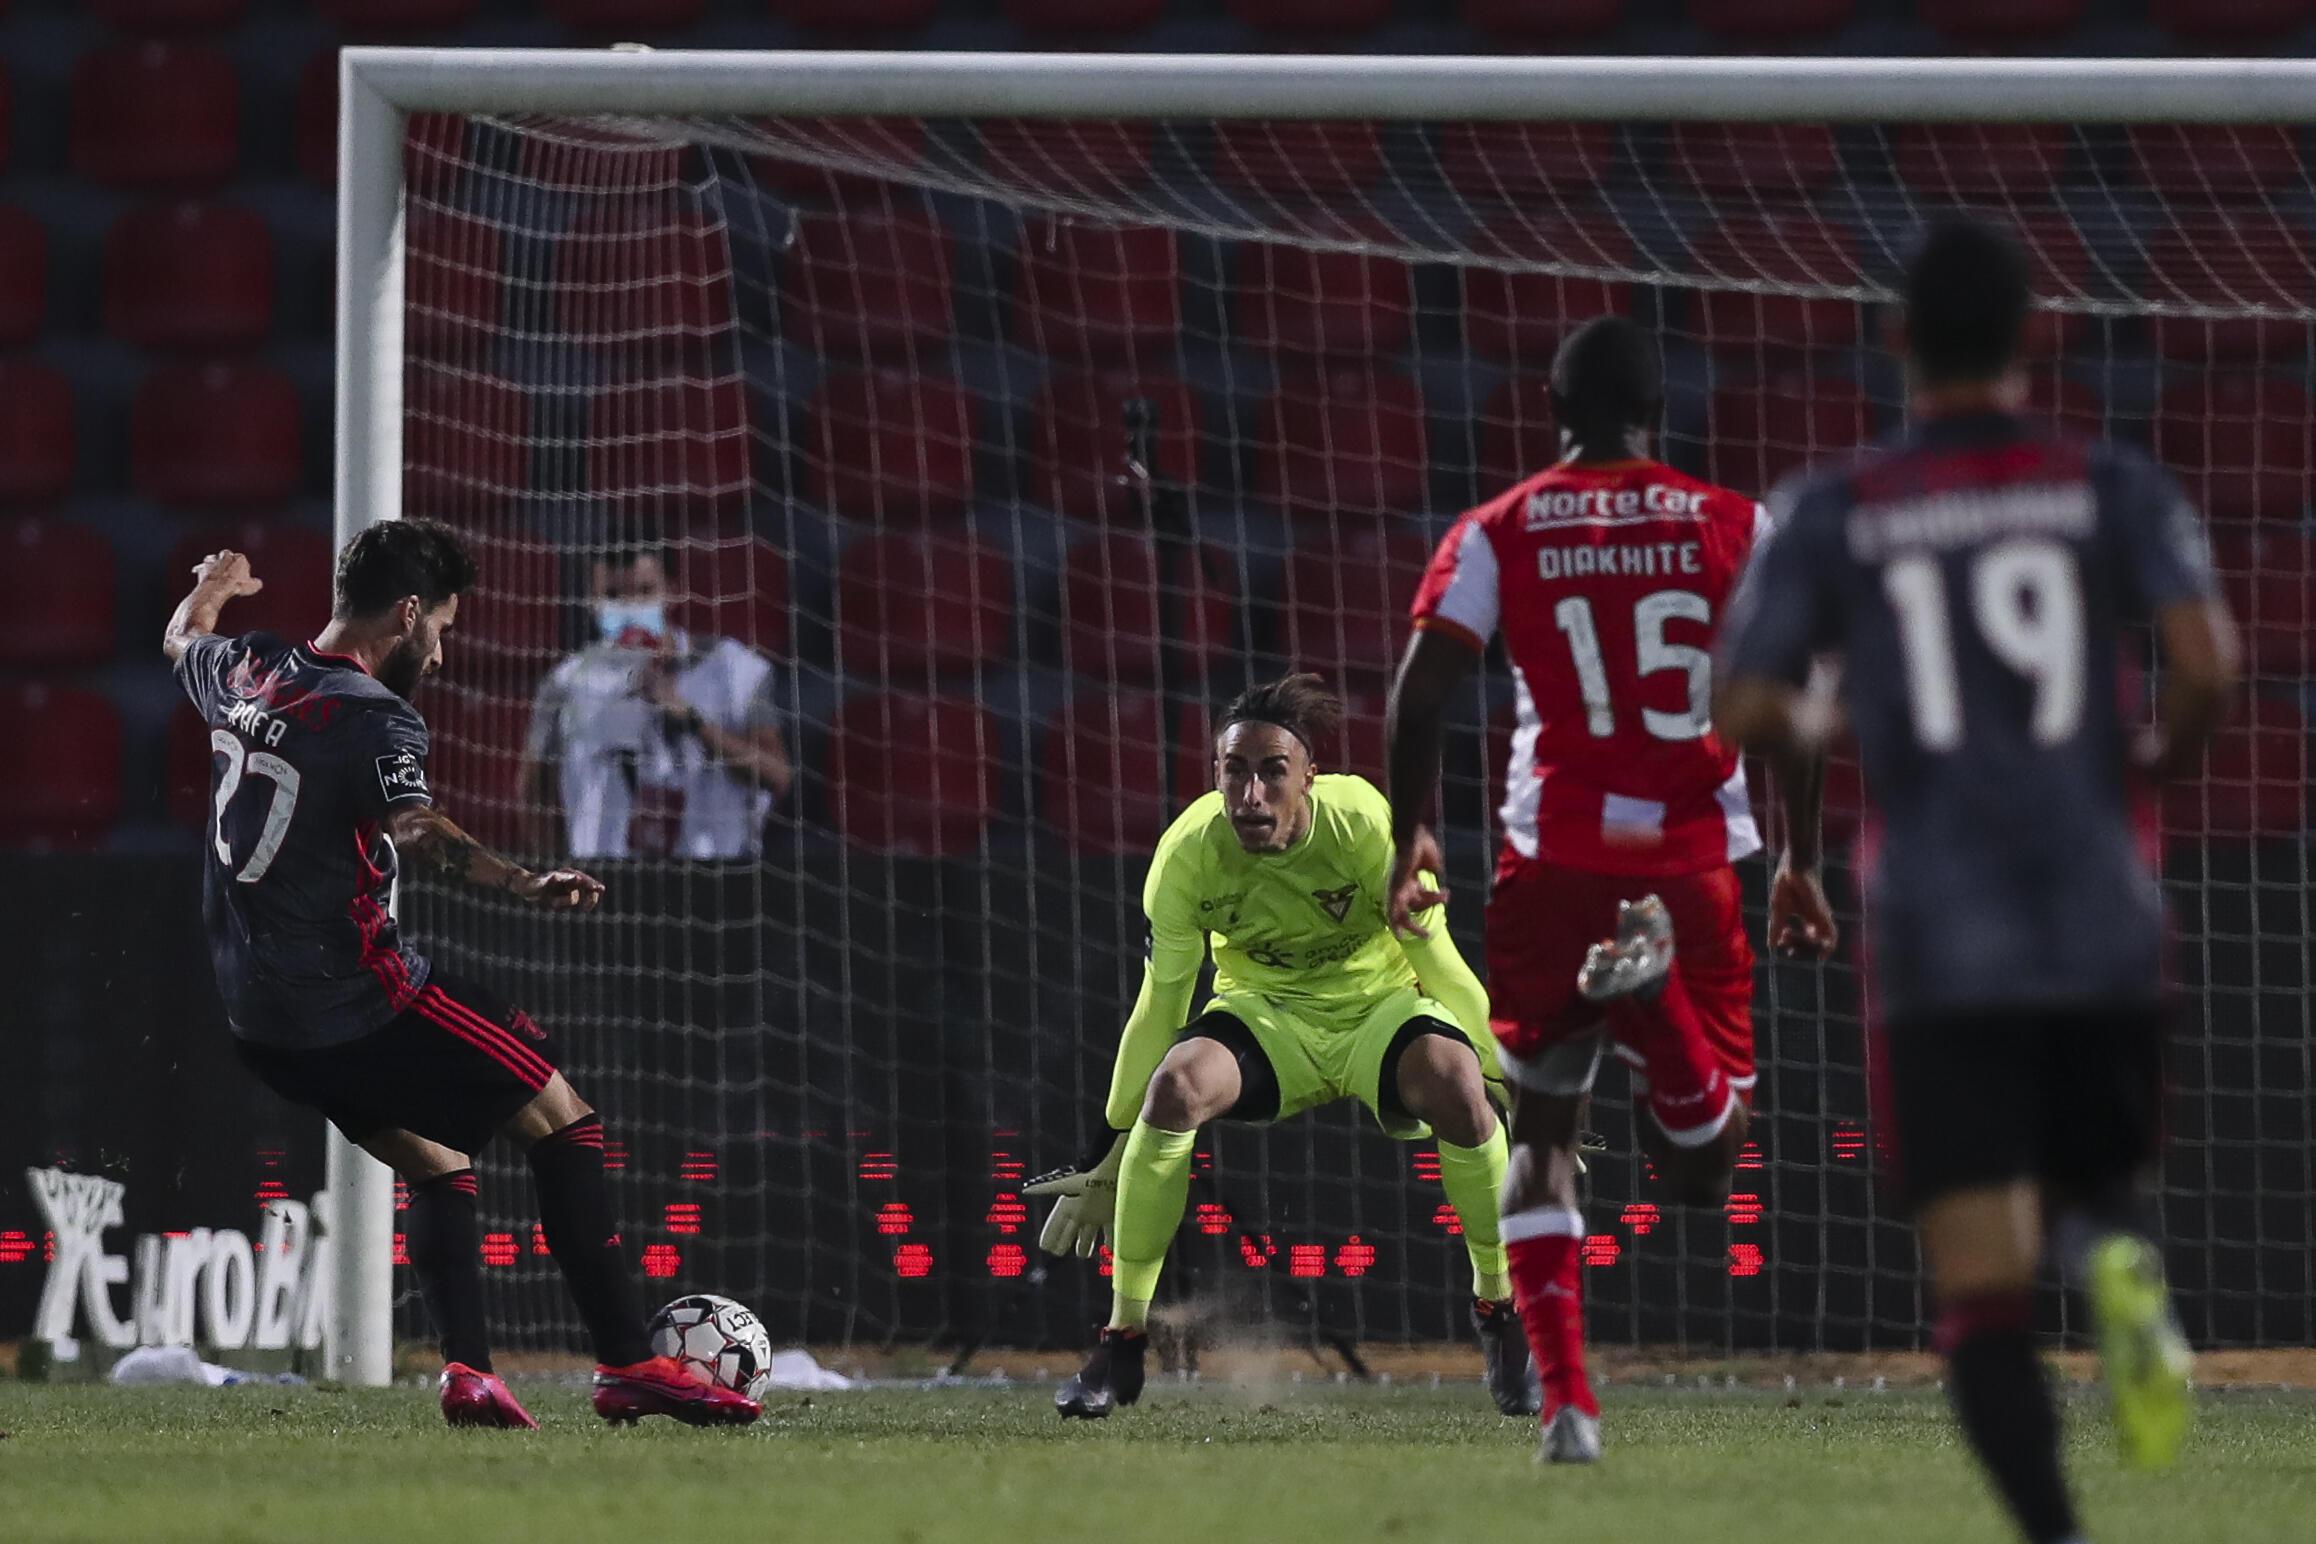 Rafa Silva (na esquerda), avançado do Benfica, apontou o primeiro golo dos encarnados que derrotaram por 0-4 o Desportivo das Aves.